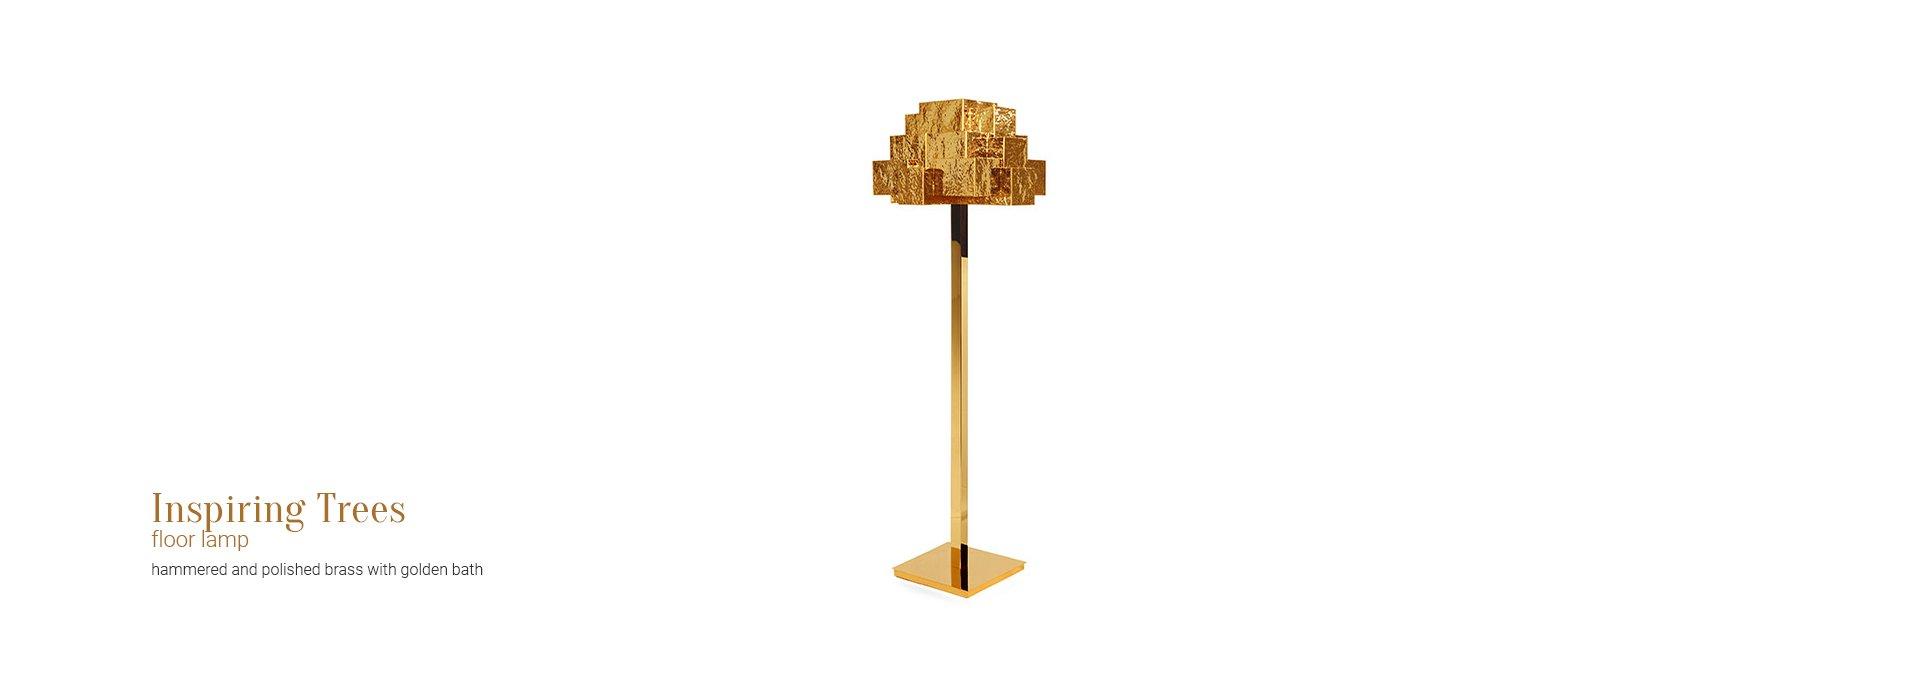 Inspiring Trees Floor Lamp Insidherland Joana Santos